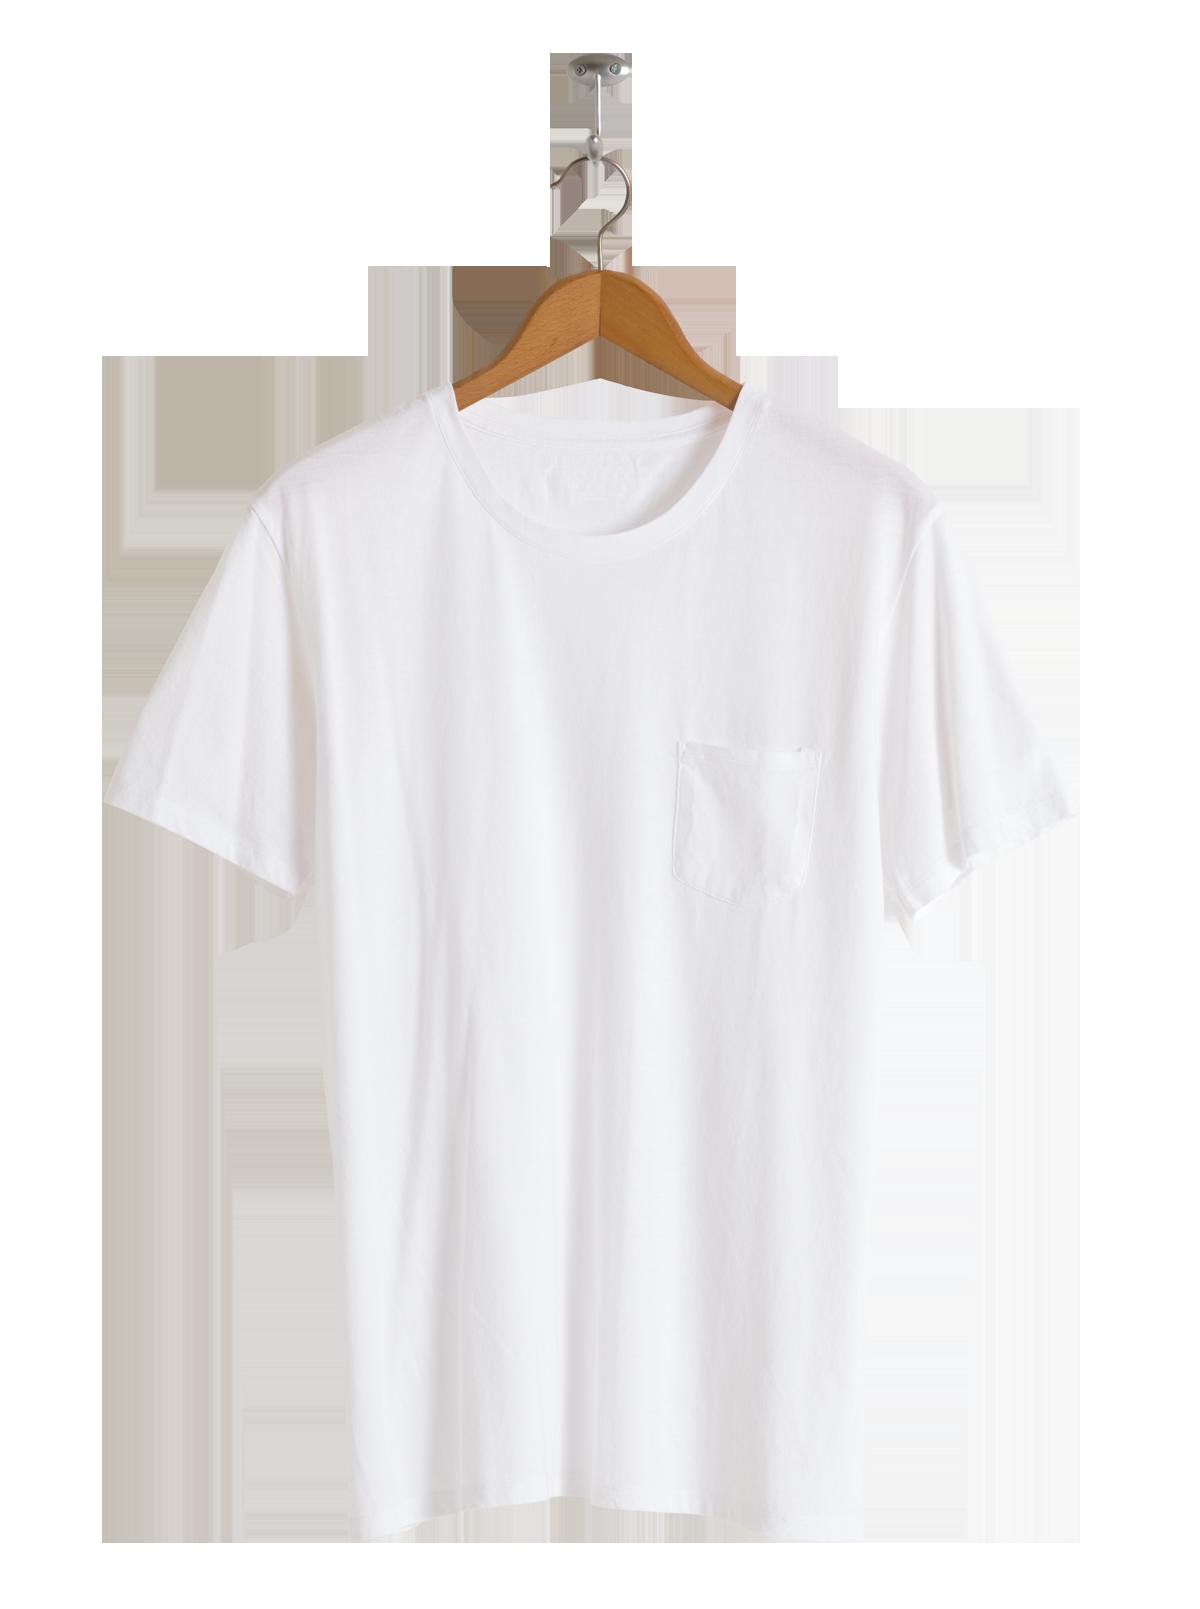 T shirt white png - Neushop Men Webb Tshirt White